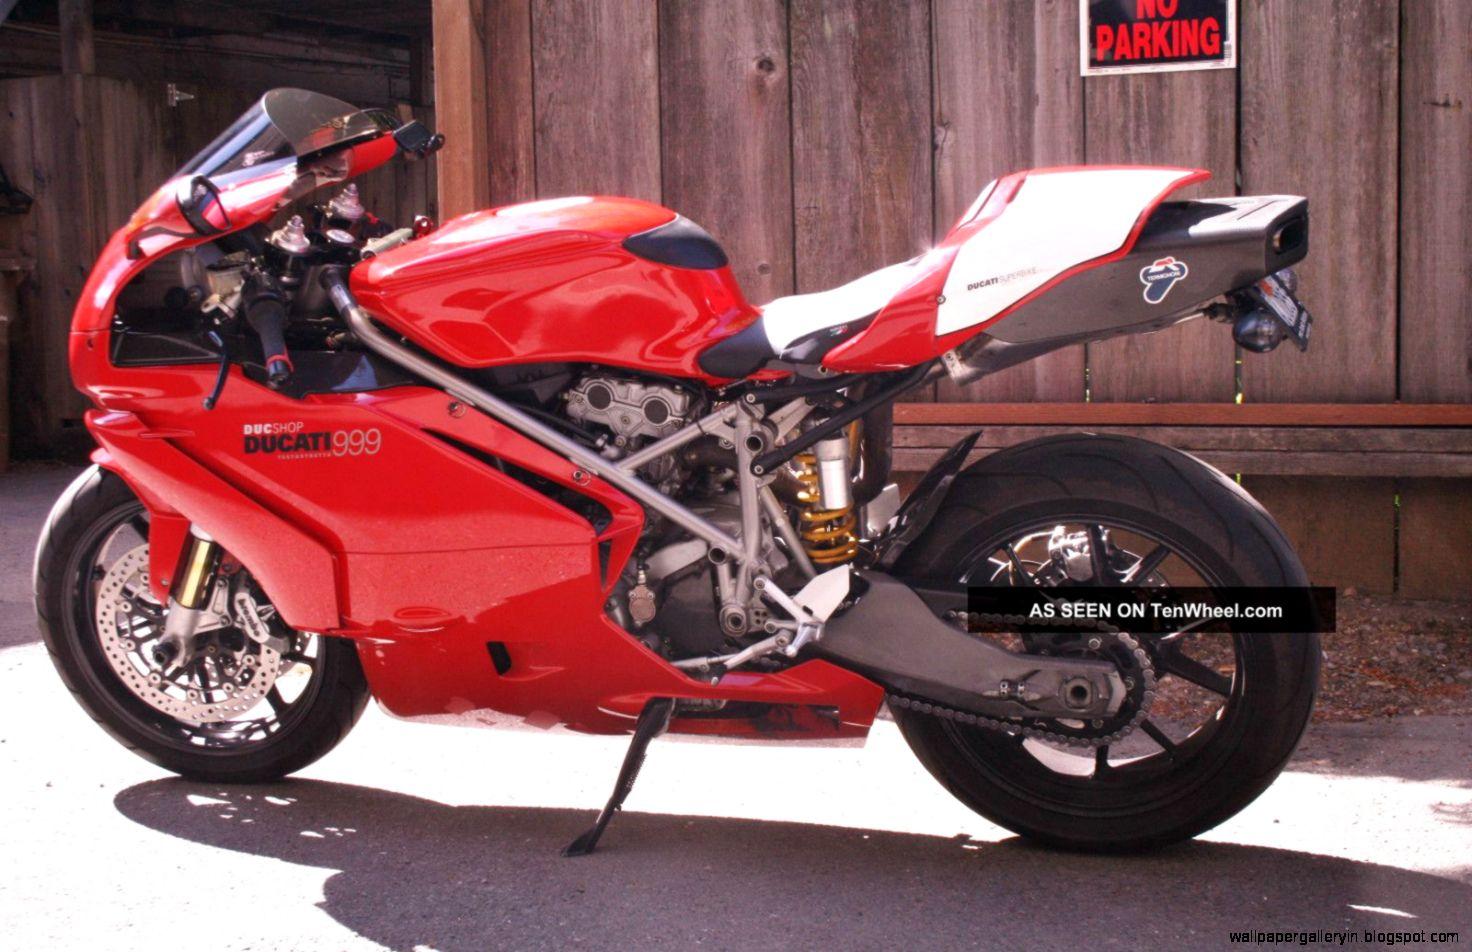 Photo Superbike Ducati 999 Wallpaper Wide 13848 Wallpaper